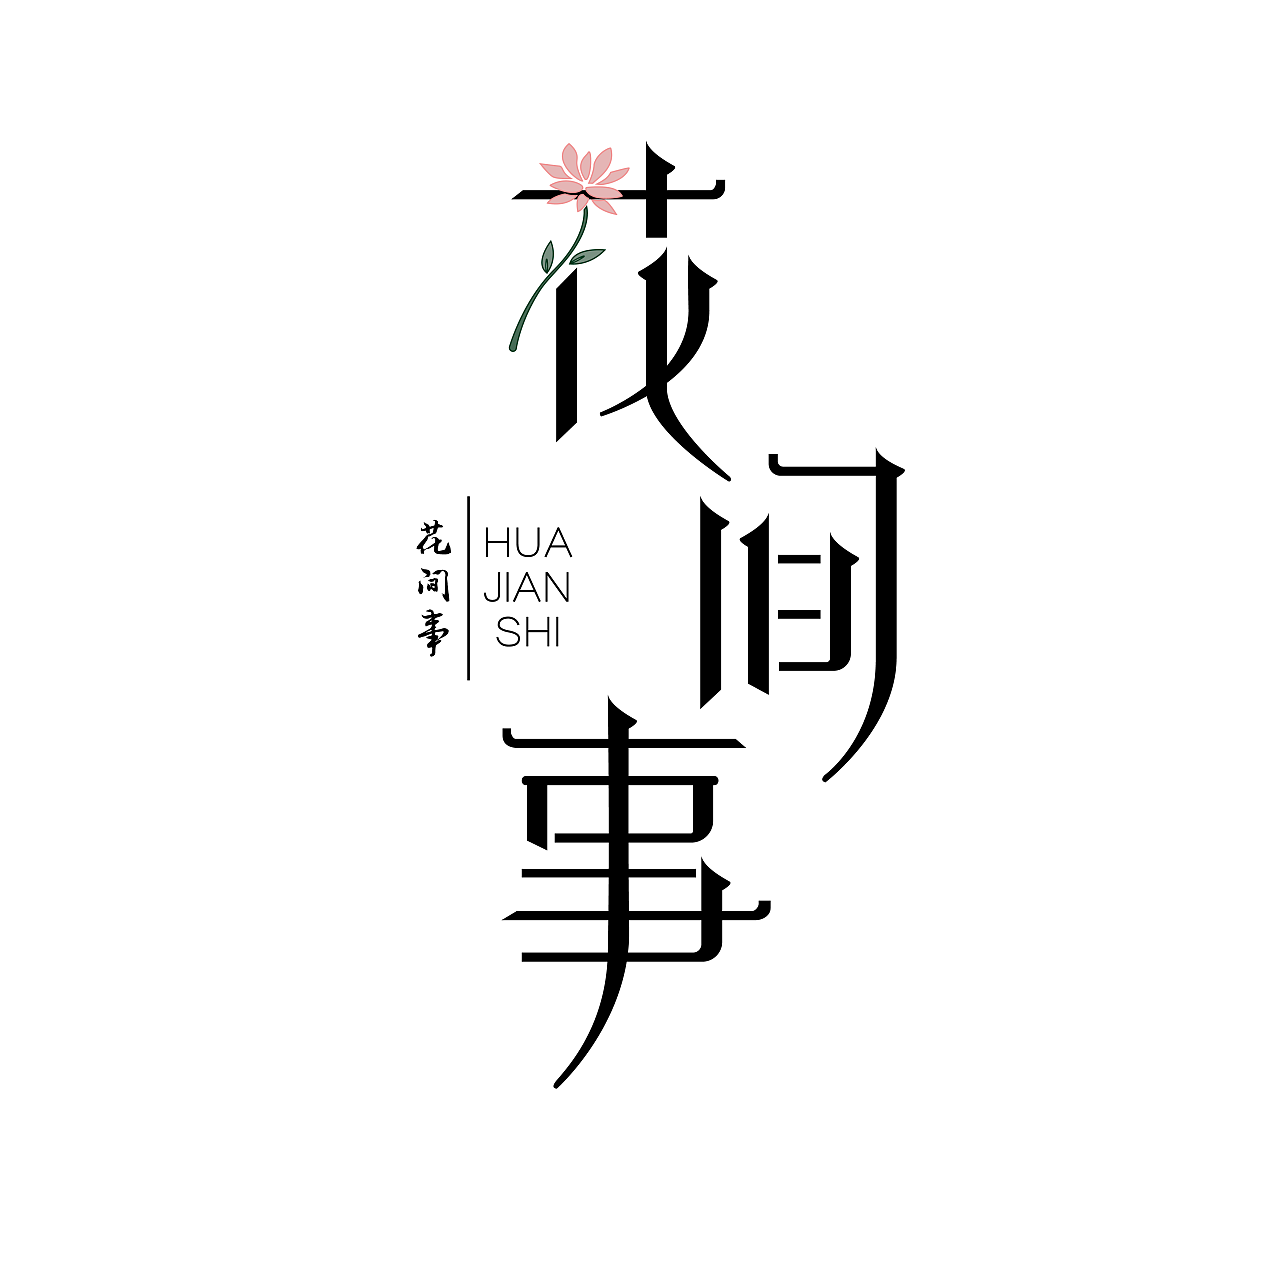 chinesefontdesign.com 2017 10 11 13 19 25 532589 16P Creative Chinese font logo design scheme #.38